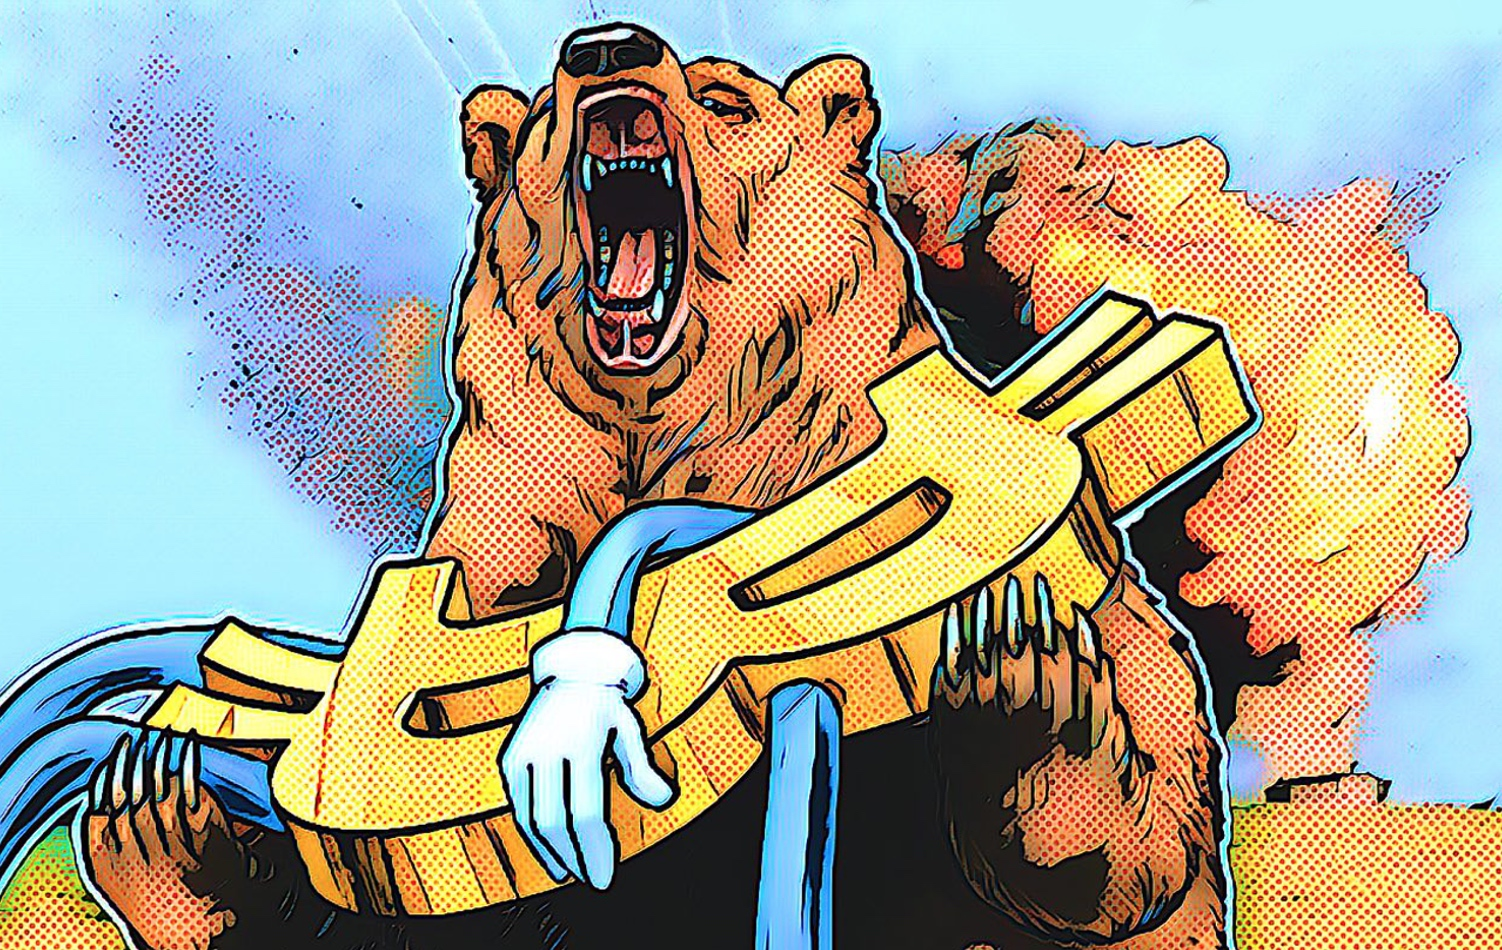 Анализ цен на криптовалюту: медведи отступают баннер